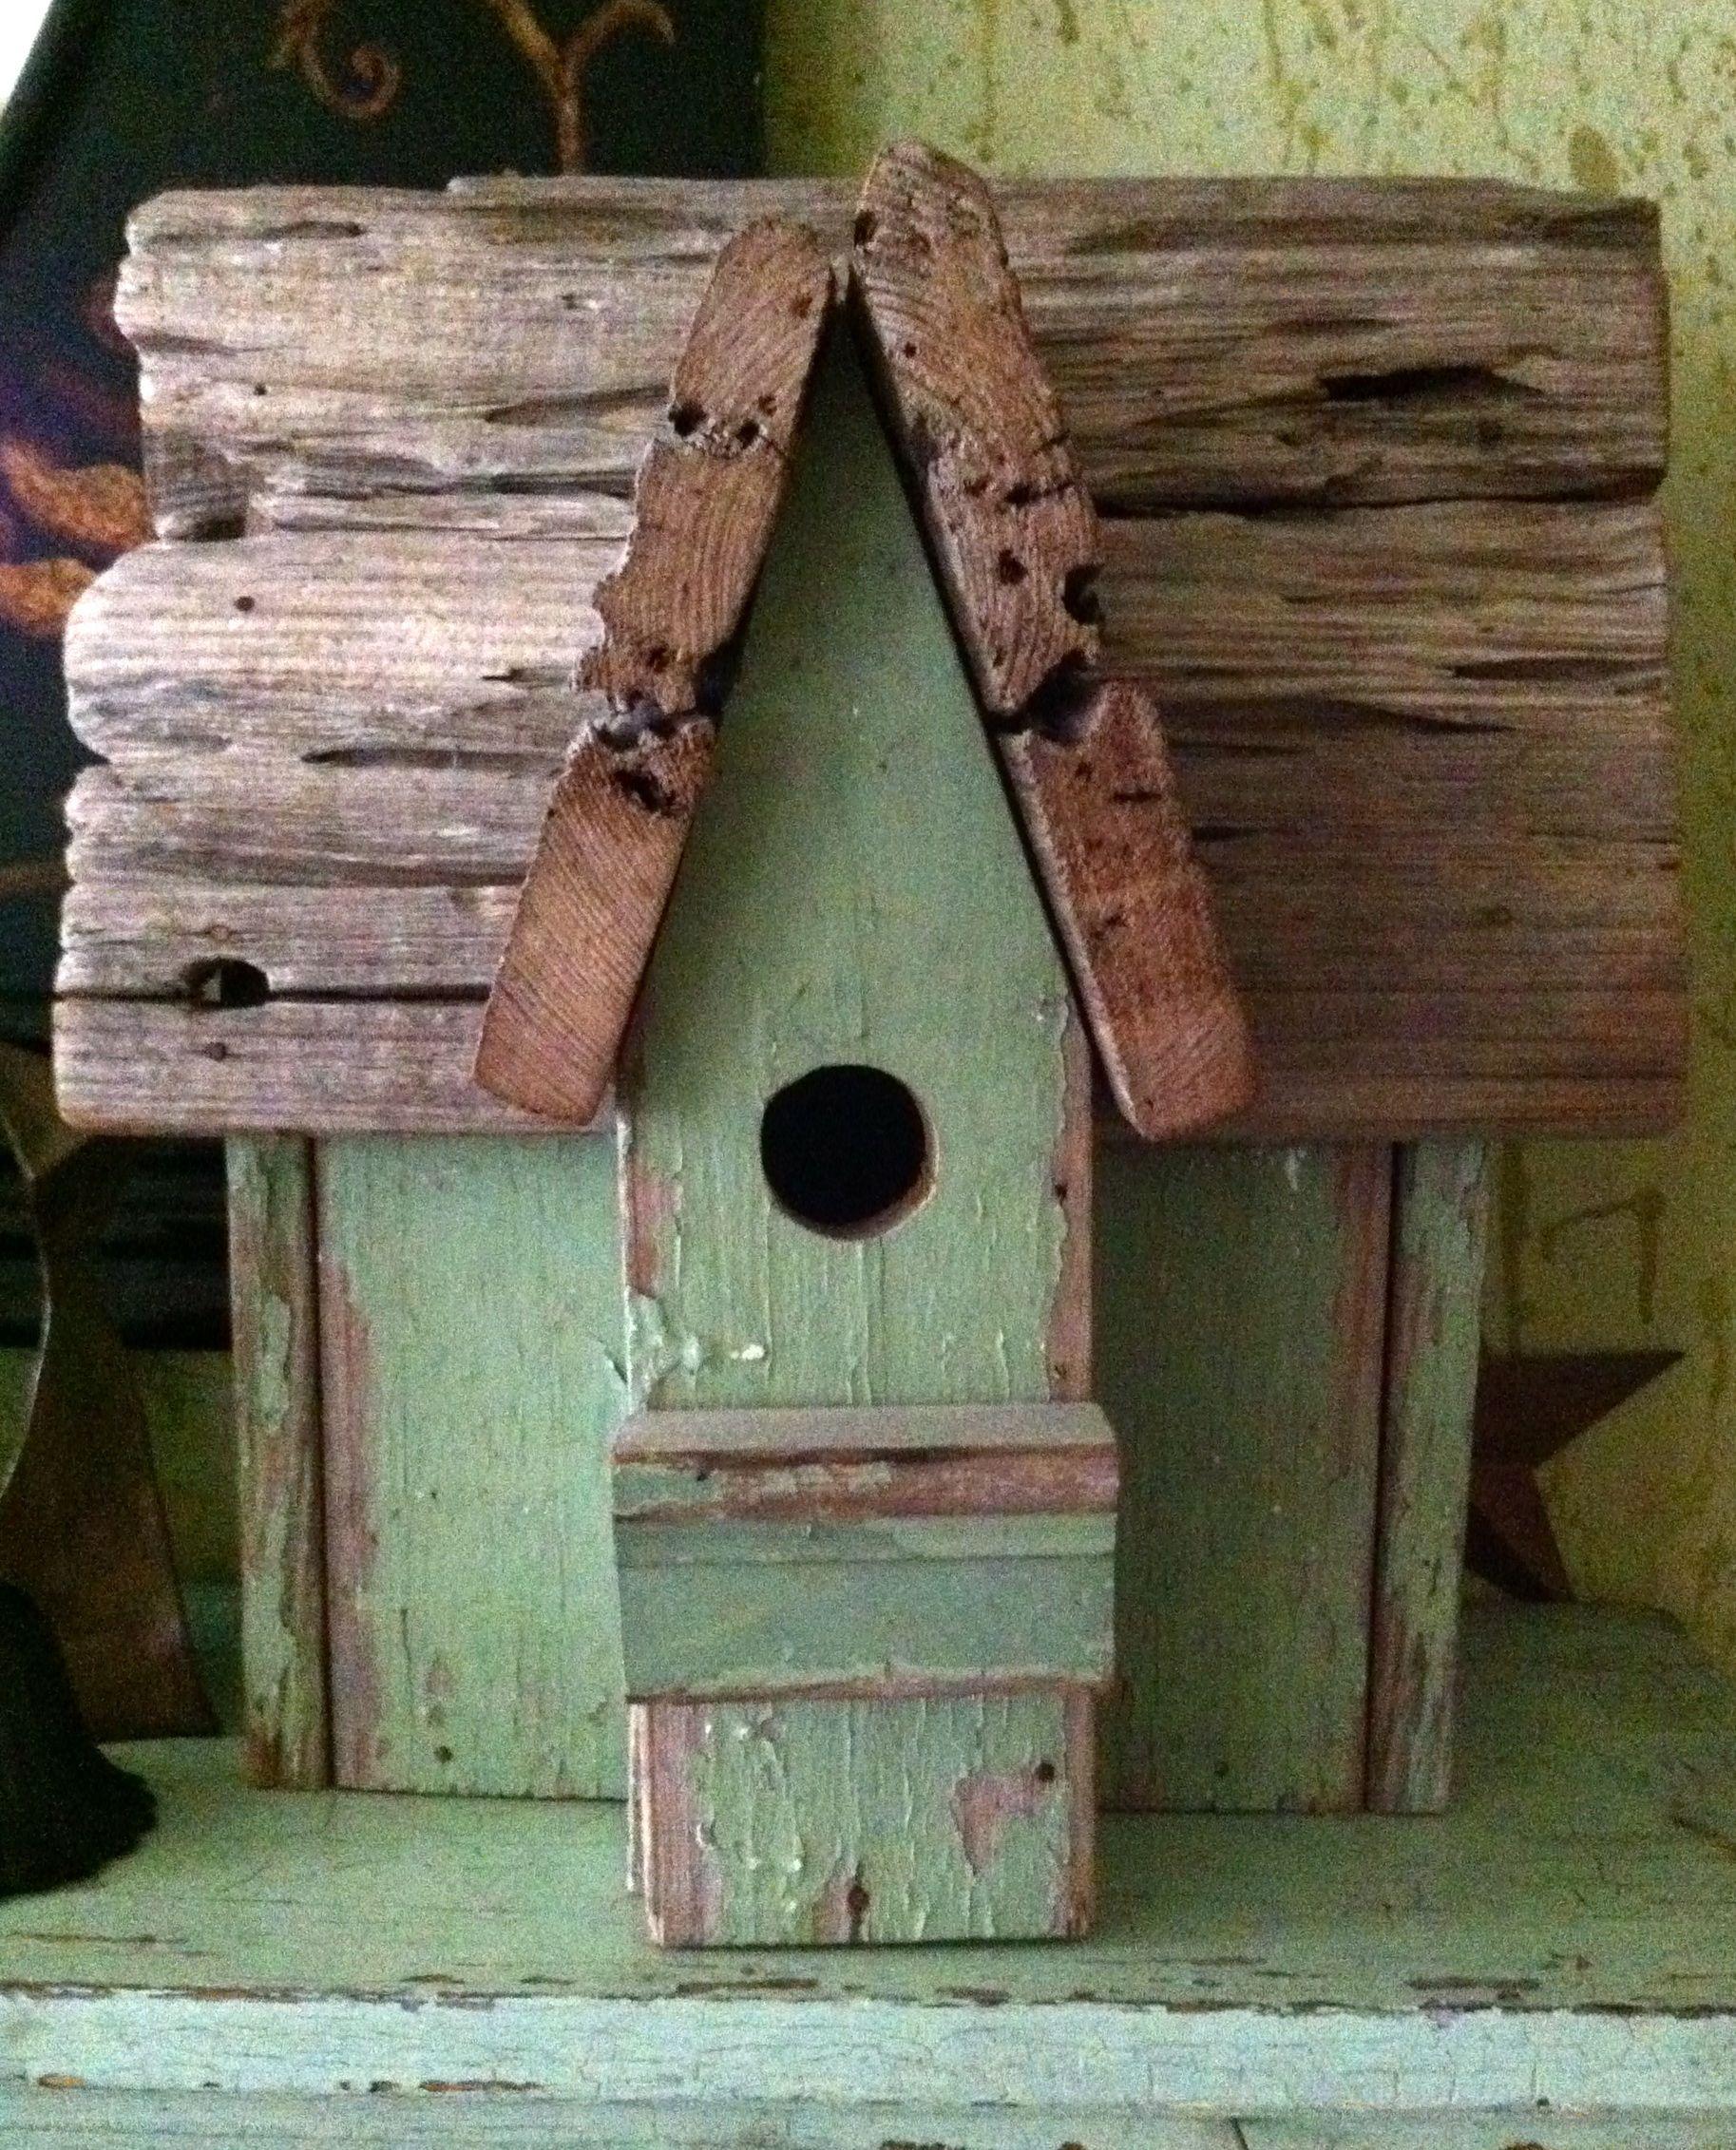 Rustic Birdhouses Rustic Green Birdhouse For The Birds Pinterest Birdhouse And